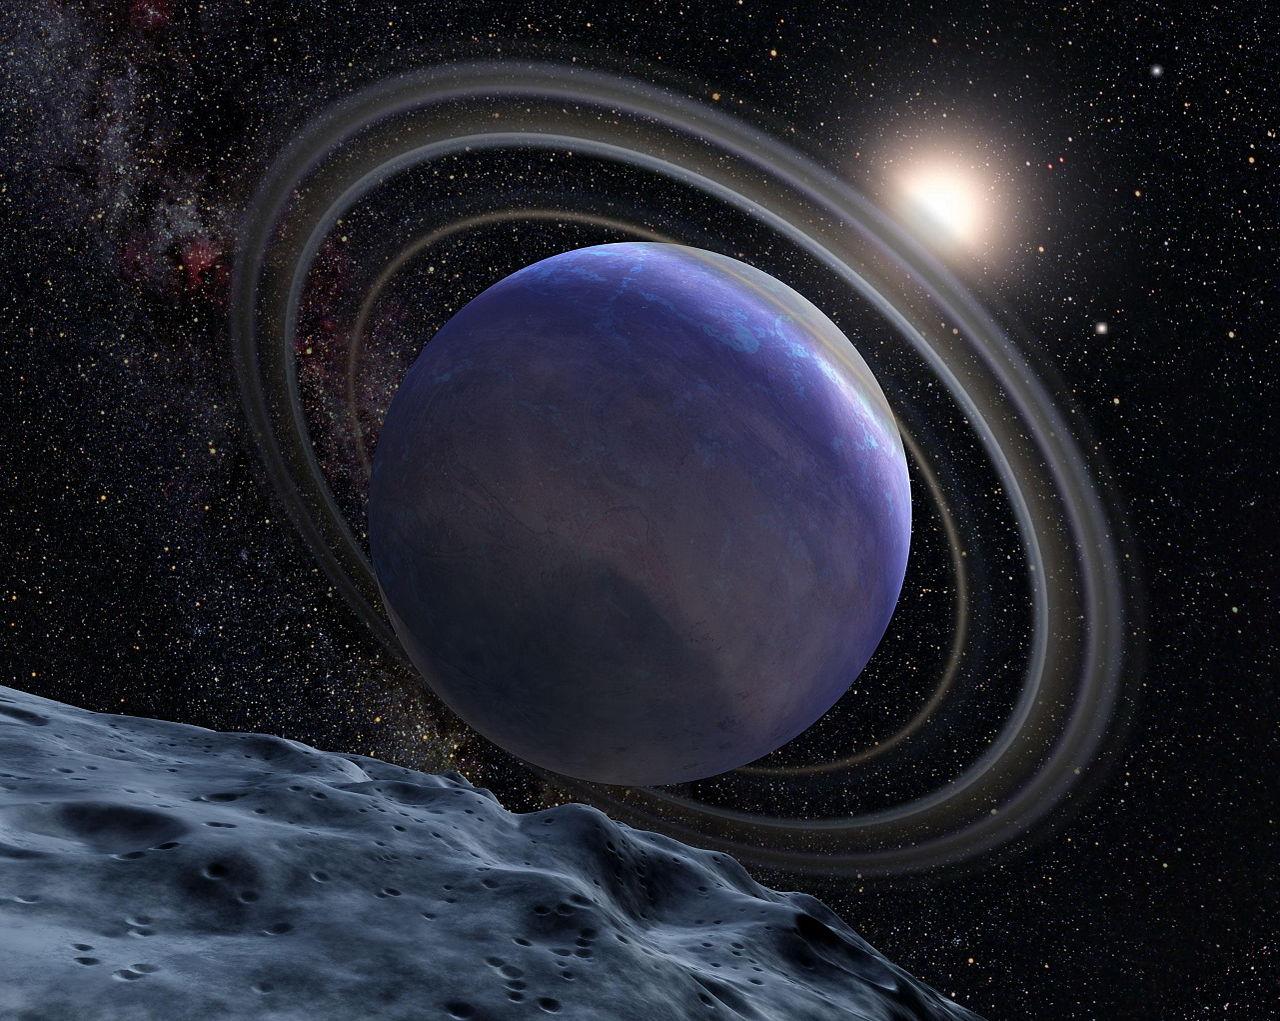 File:Planet around HR 8799.jpg - Wikimedia Commons